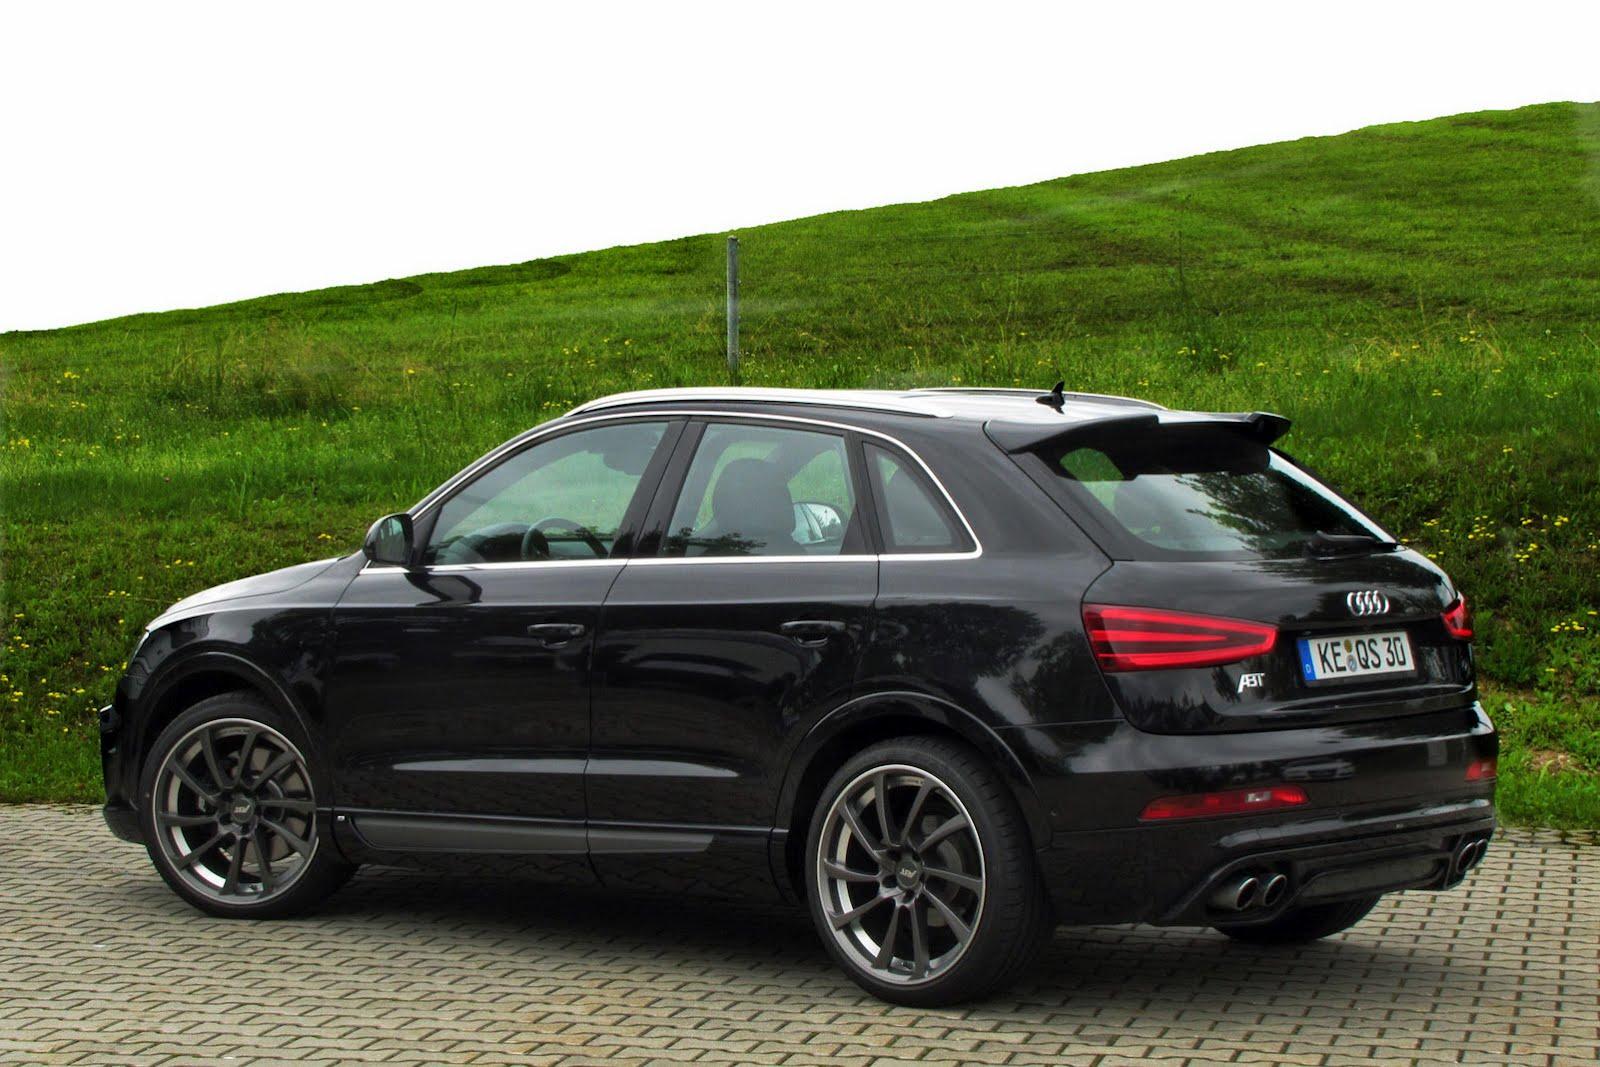 Audi Q3 prepared by ABT Sportsline